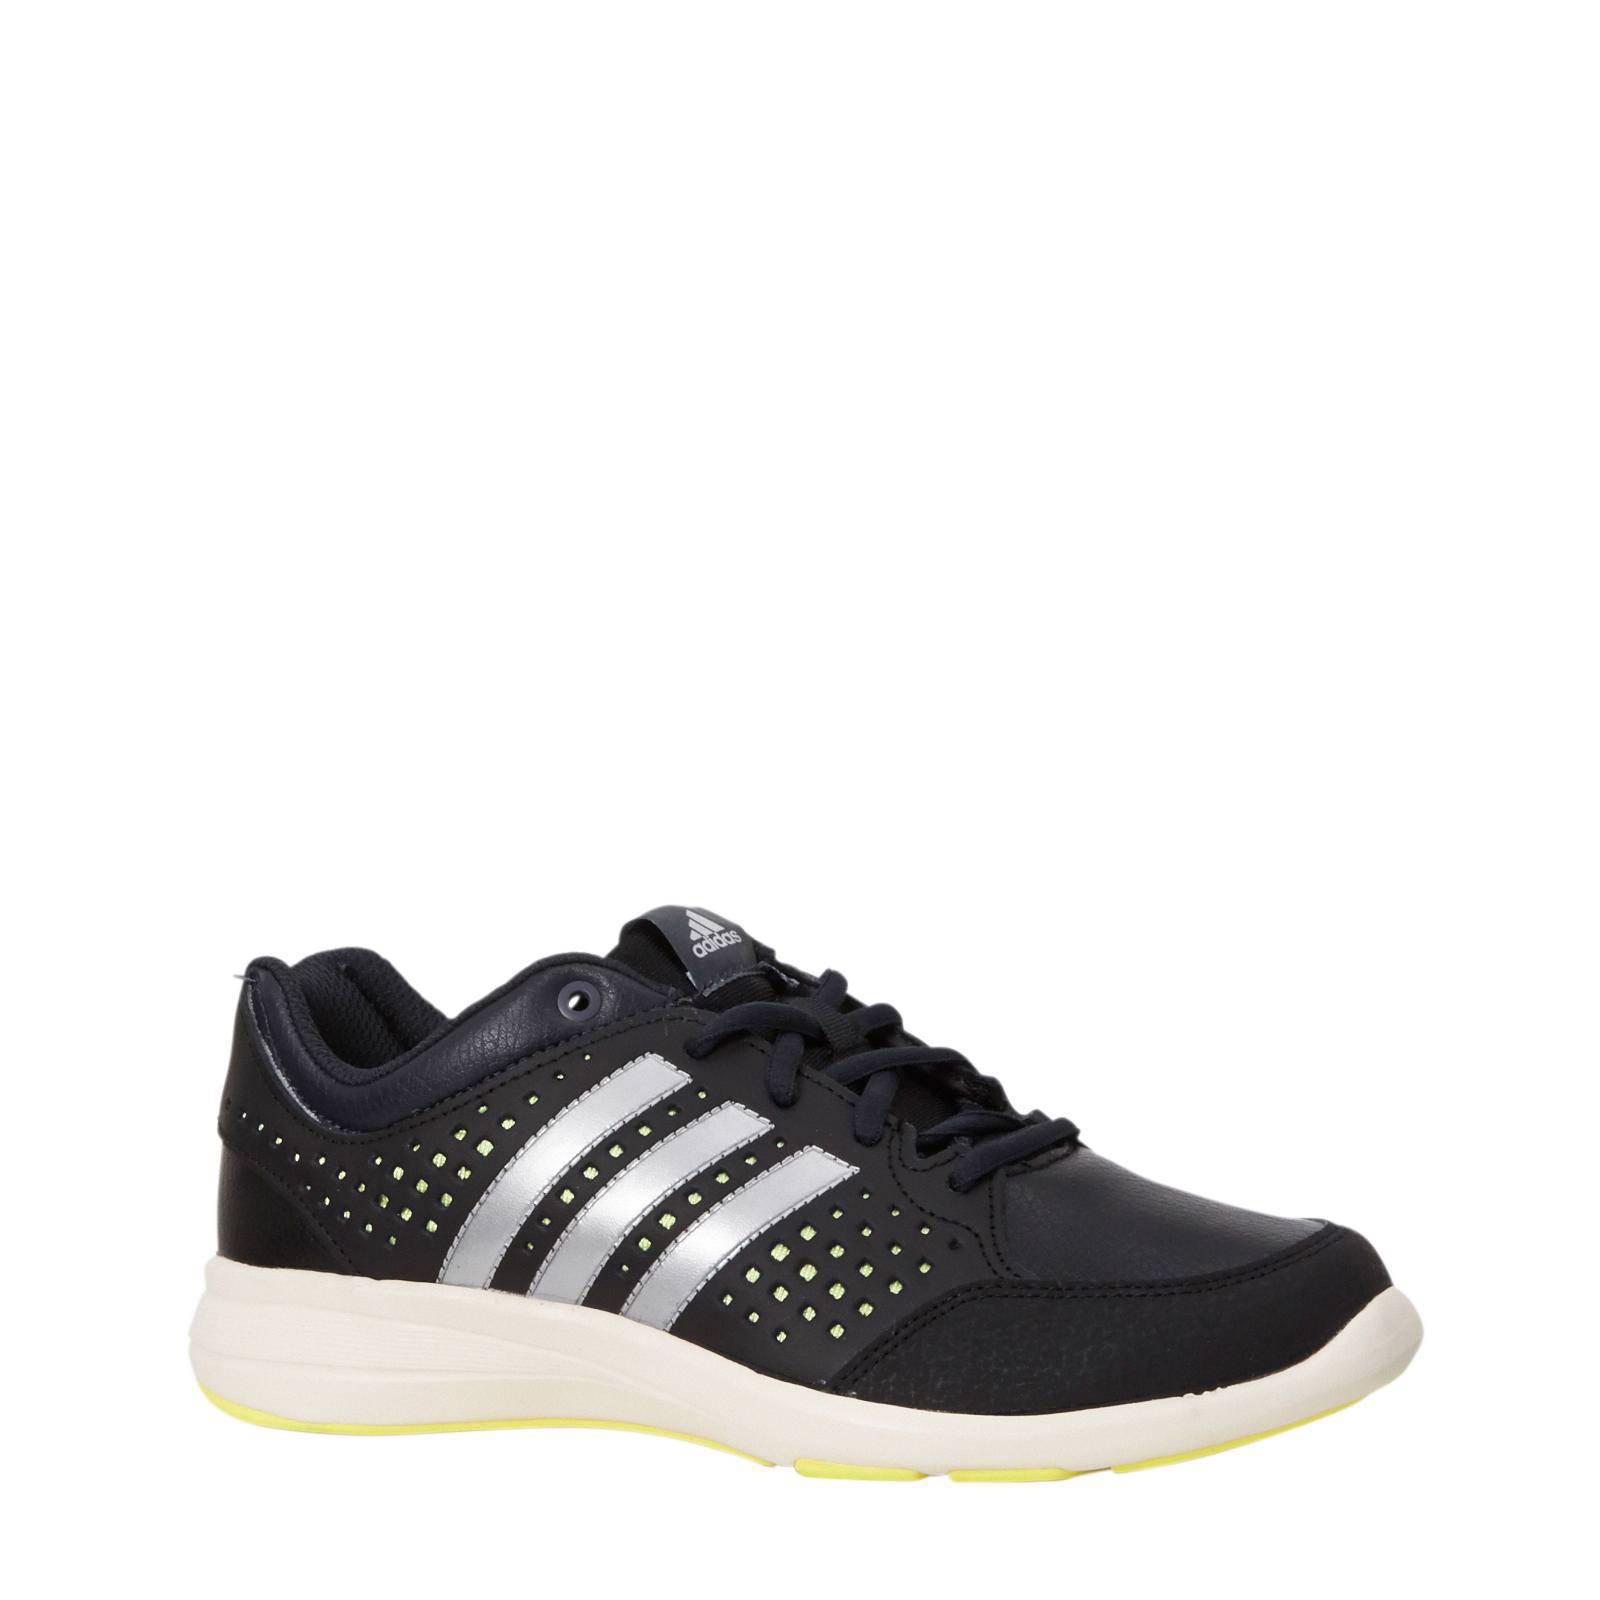 fitness schoenen Arianna 3